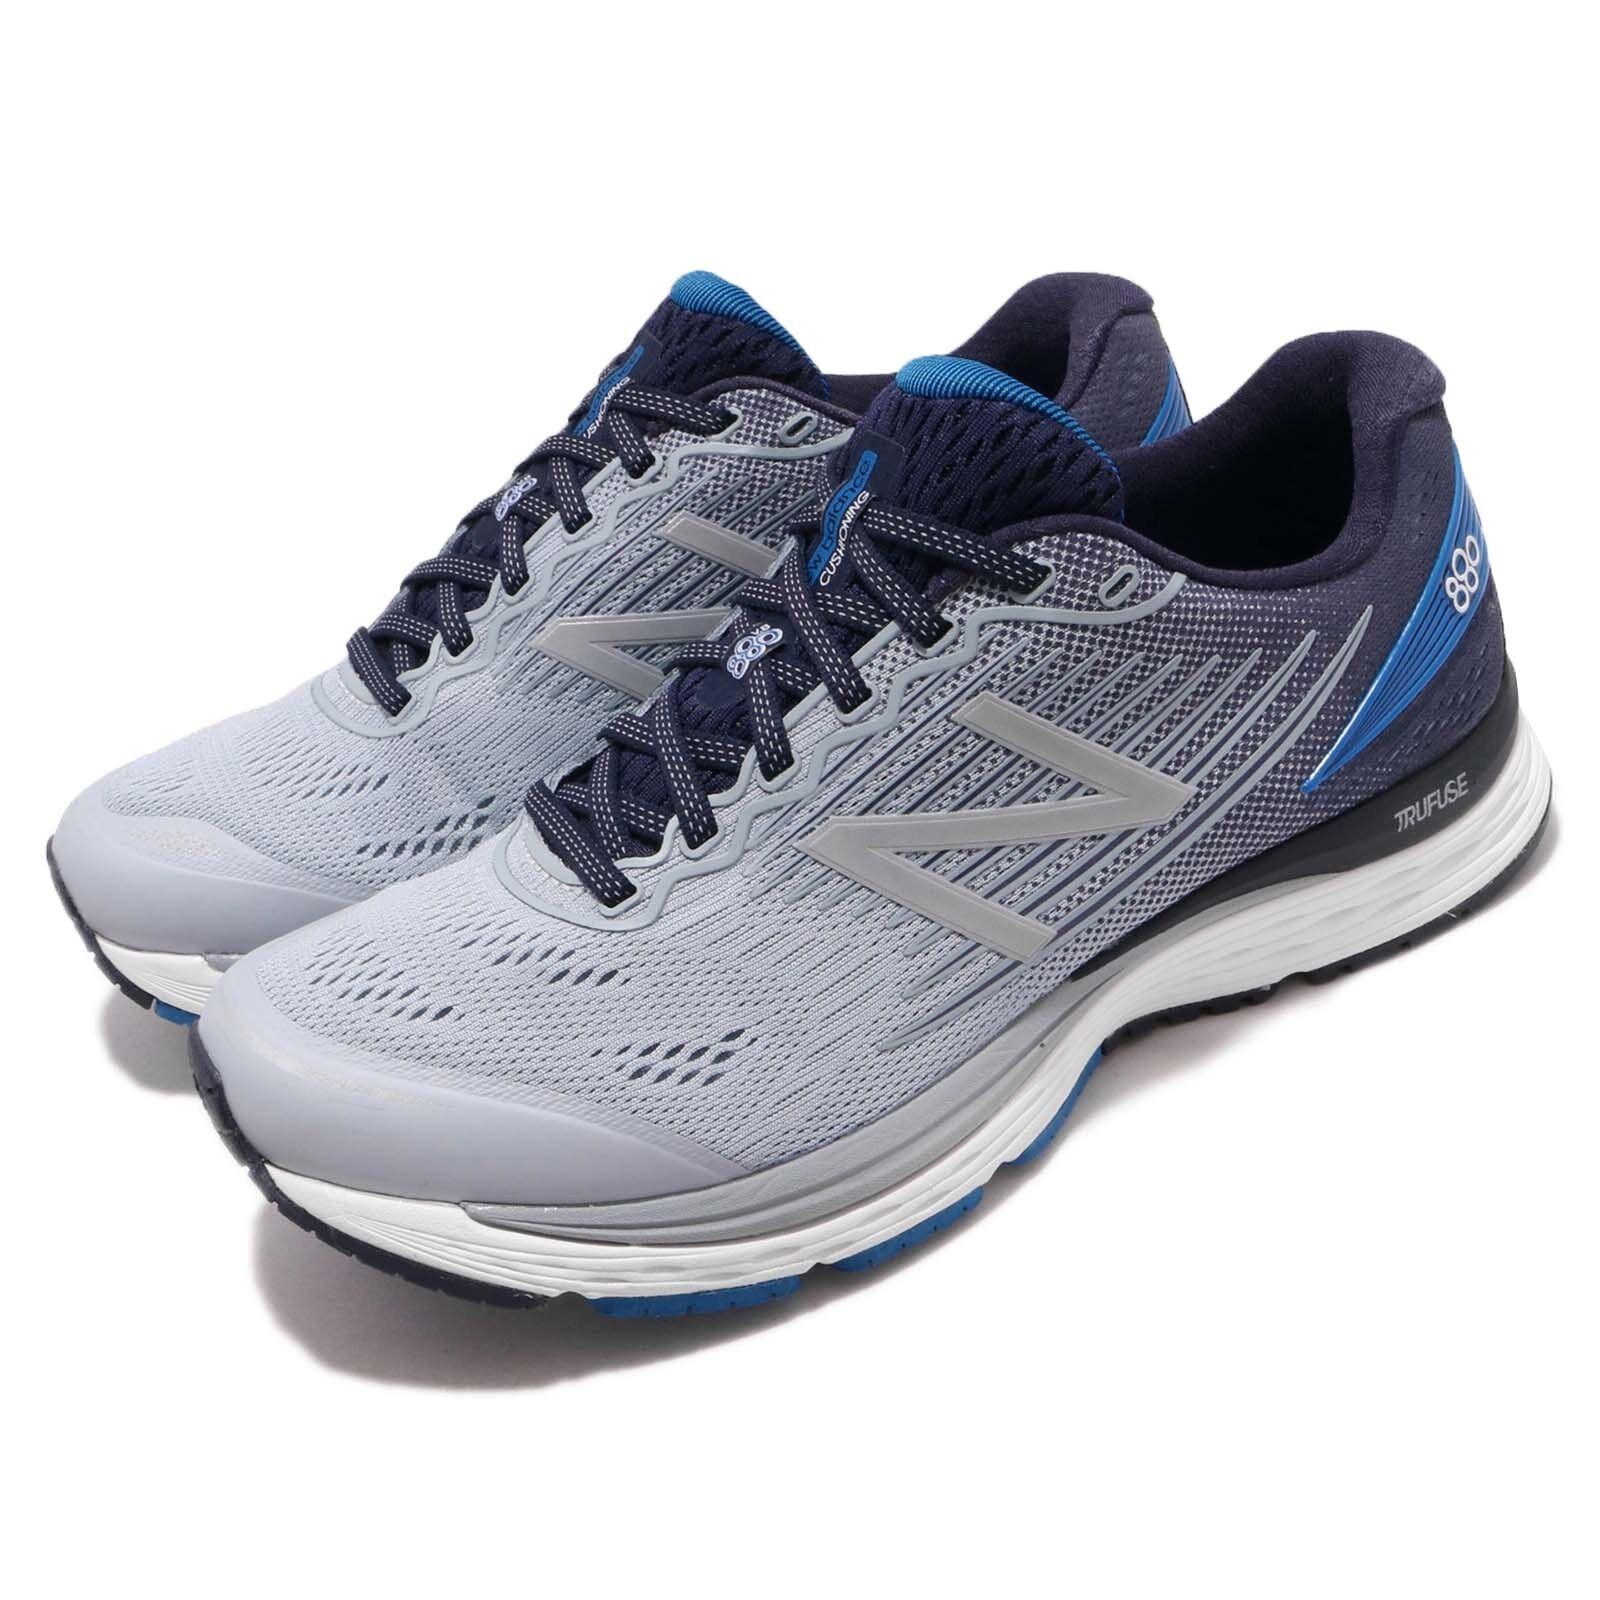 New New New Balance M880SB8 4E Extra Wide gris azul Men Running zapatos zapatillas M880SB84E 4adbaf